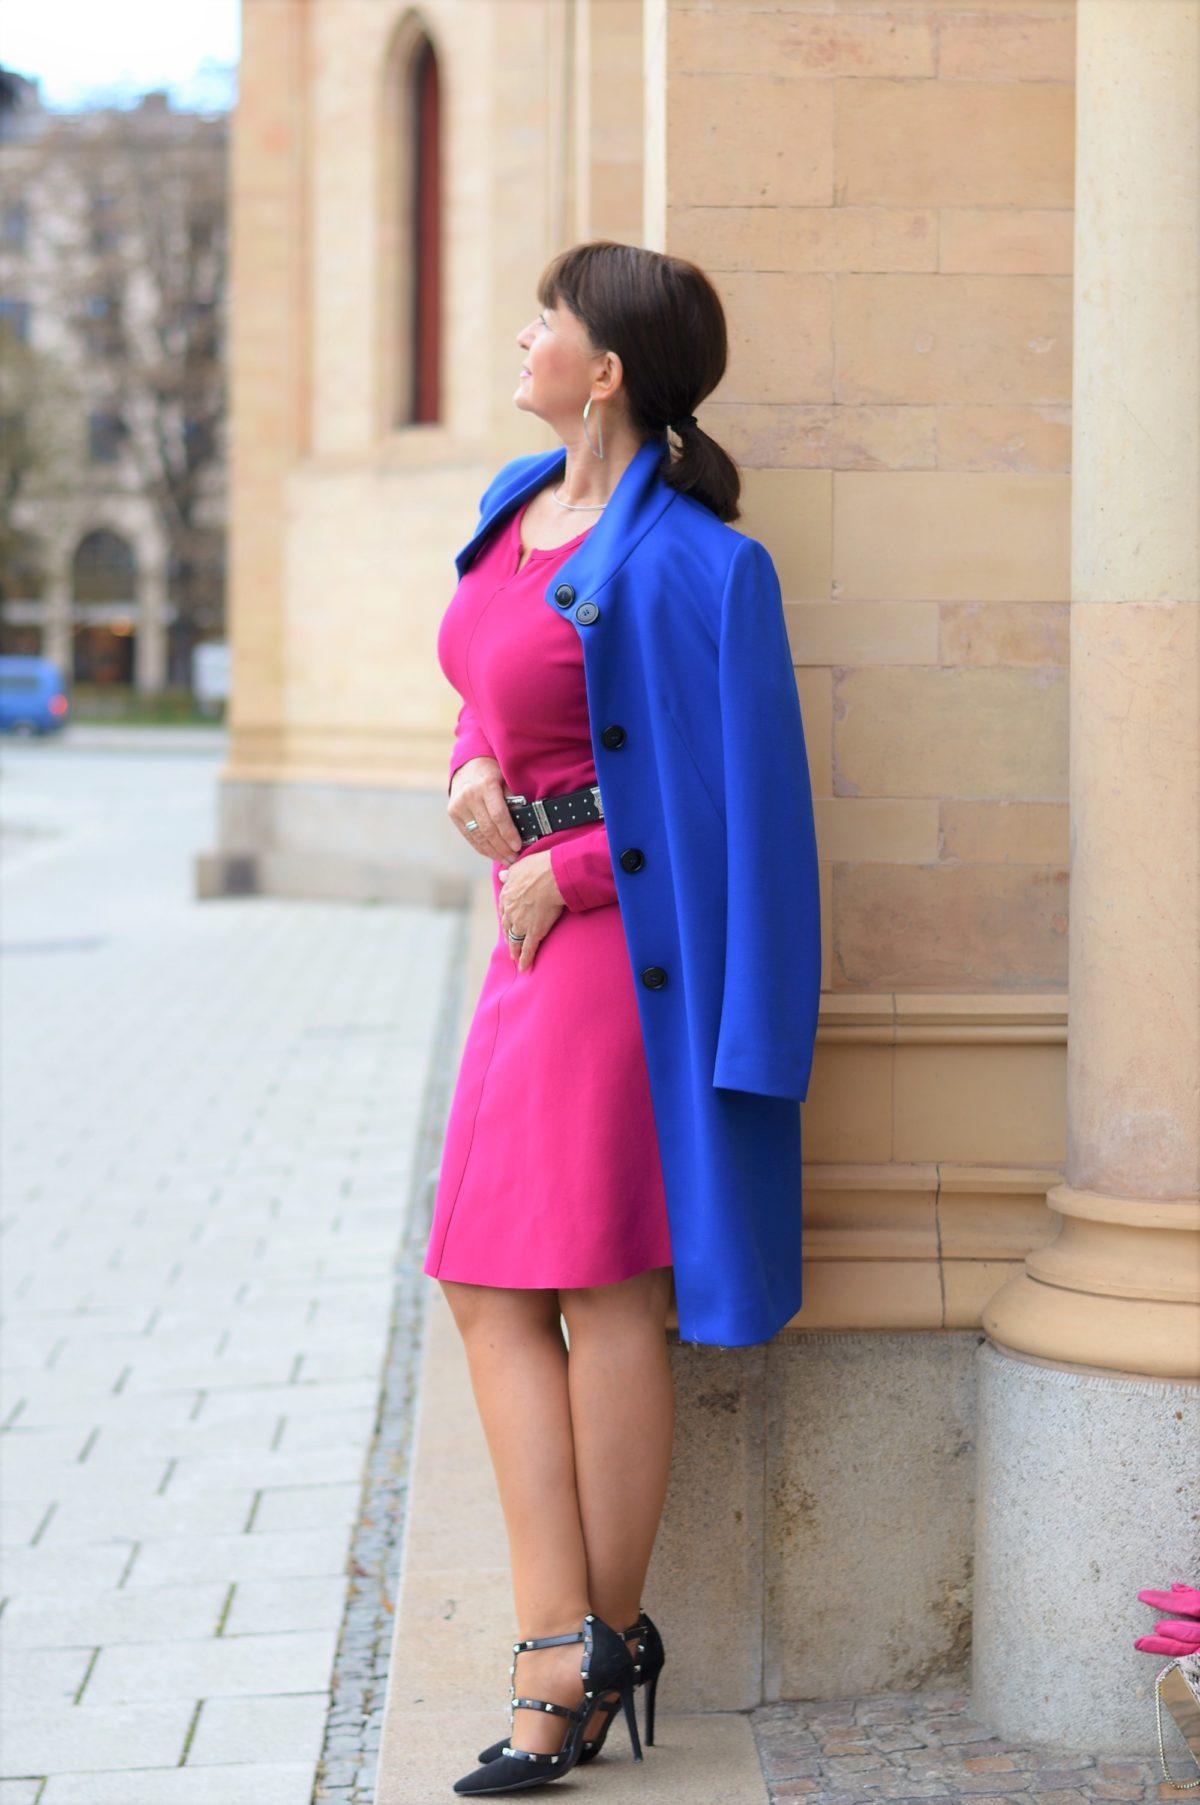 Kleid pink mit Mantel blau